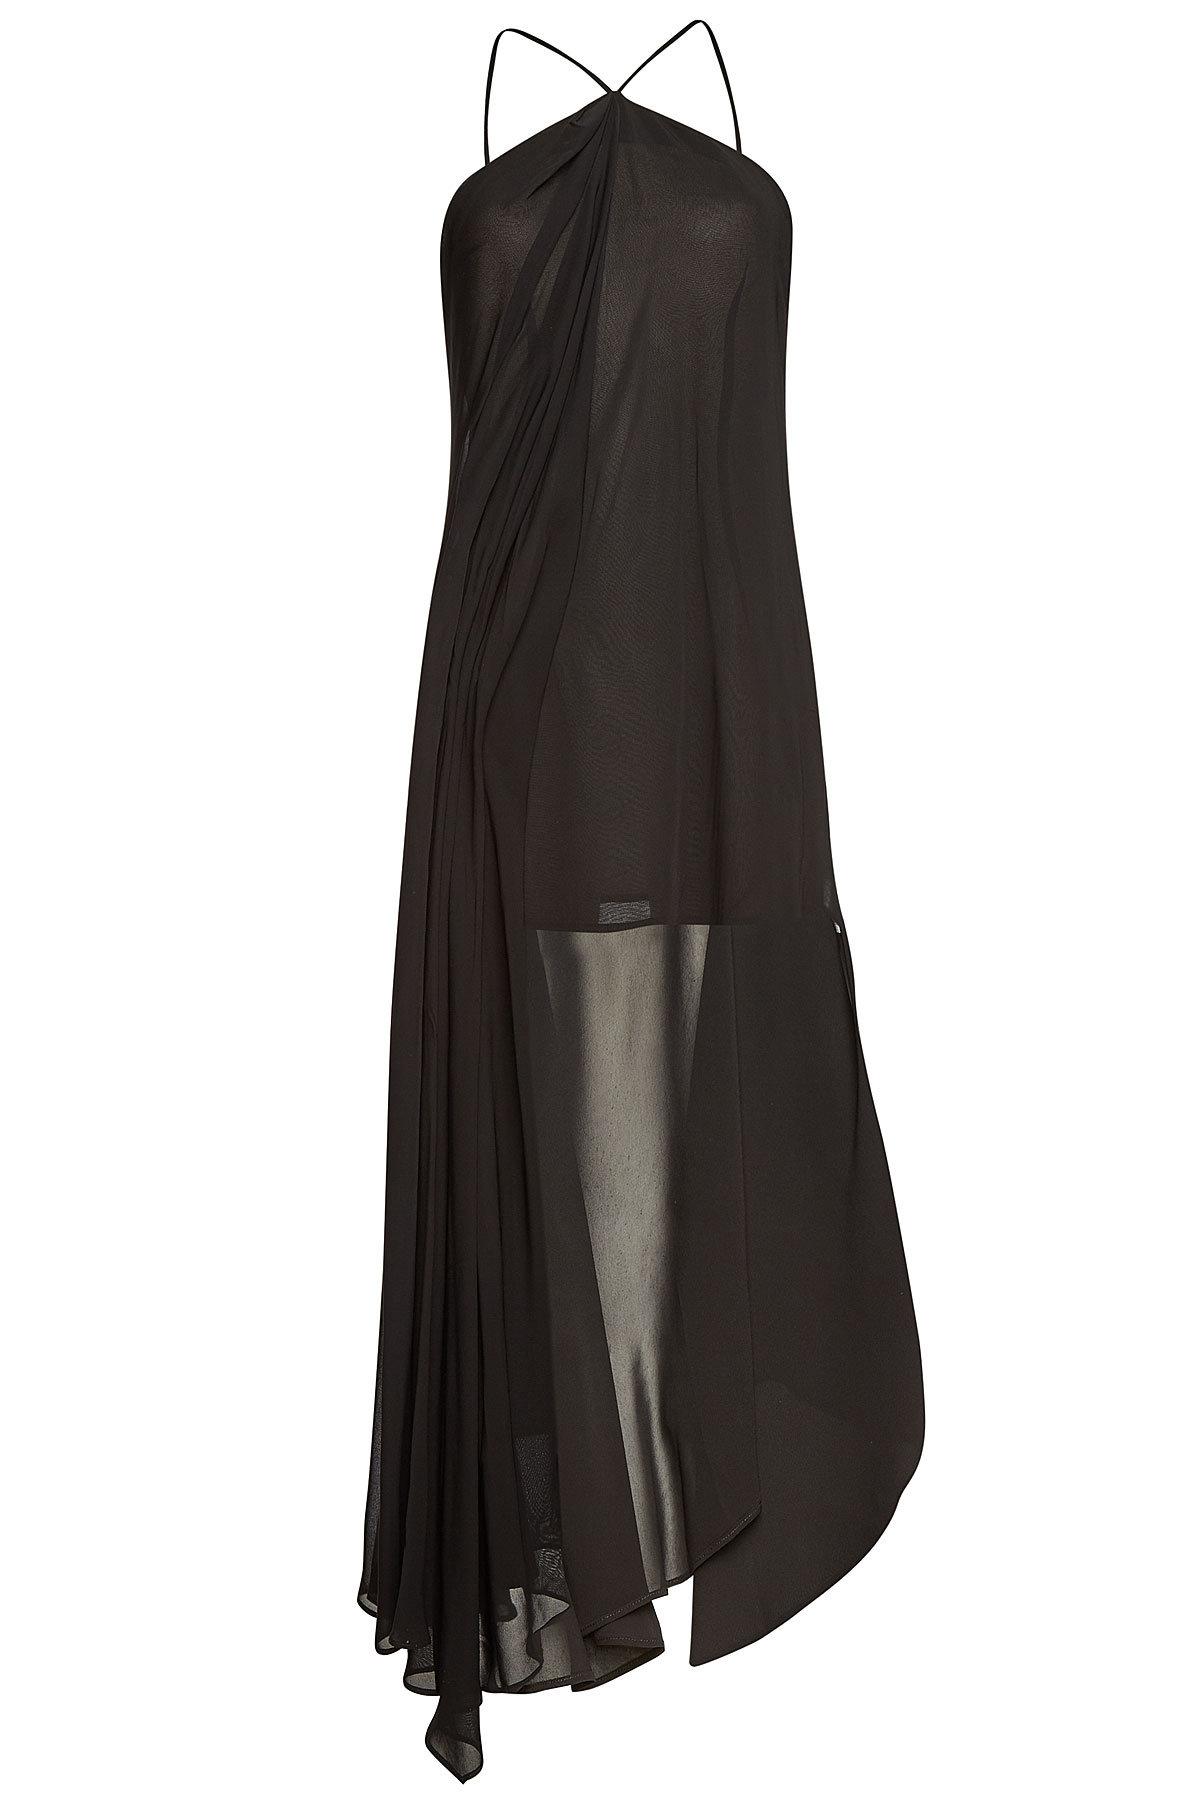 Jacquemus Asymmetric Mini-Dress In Black